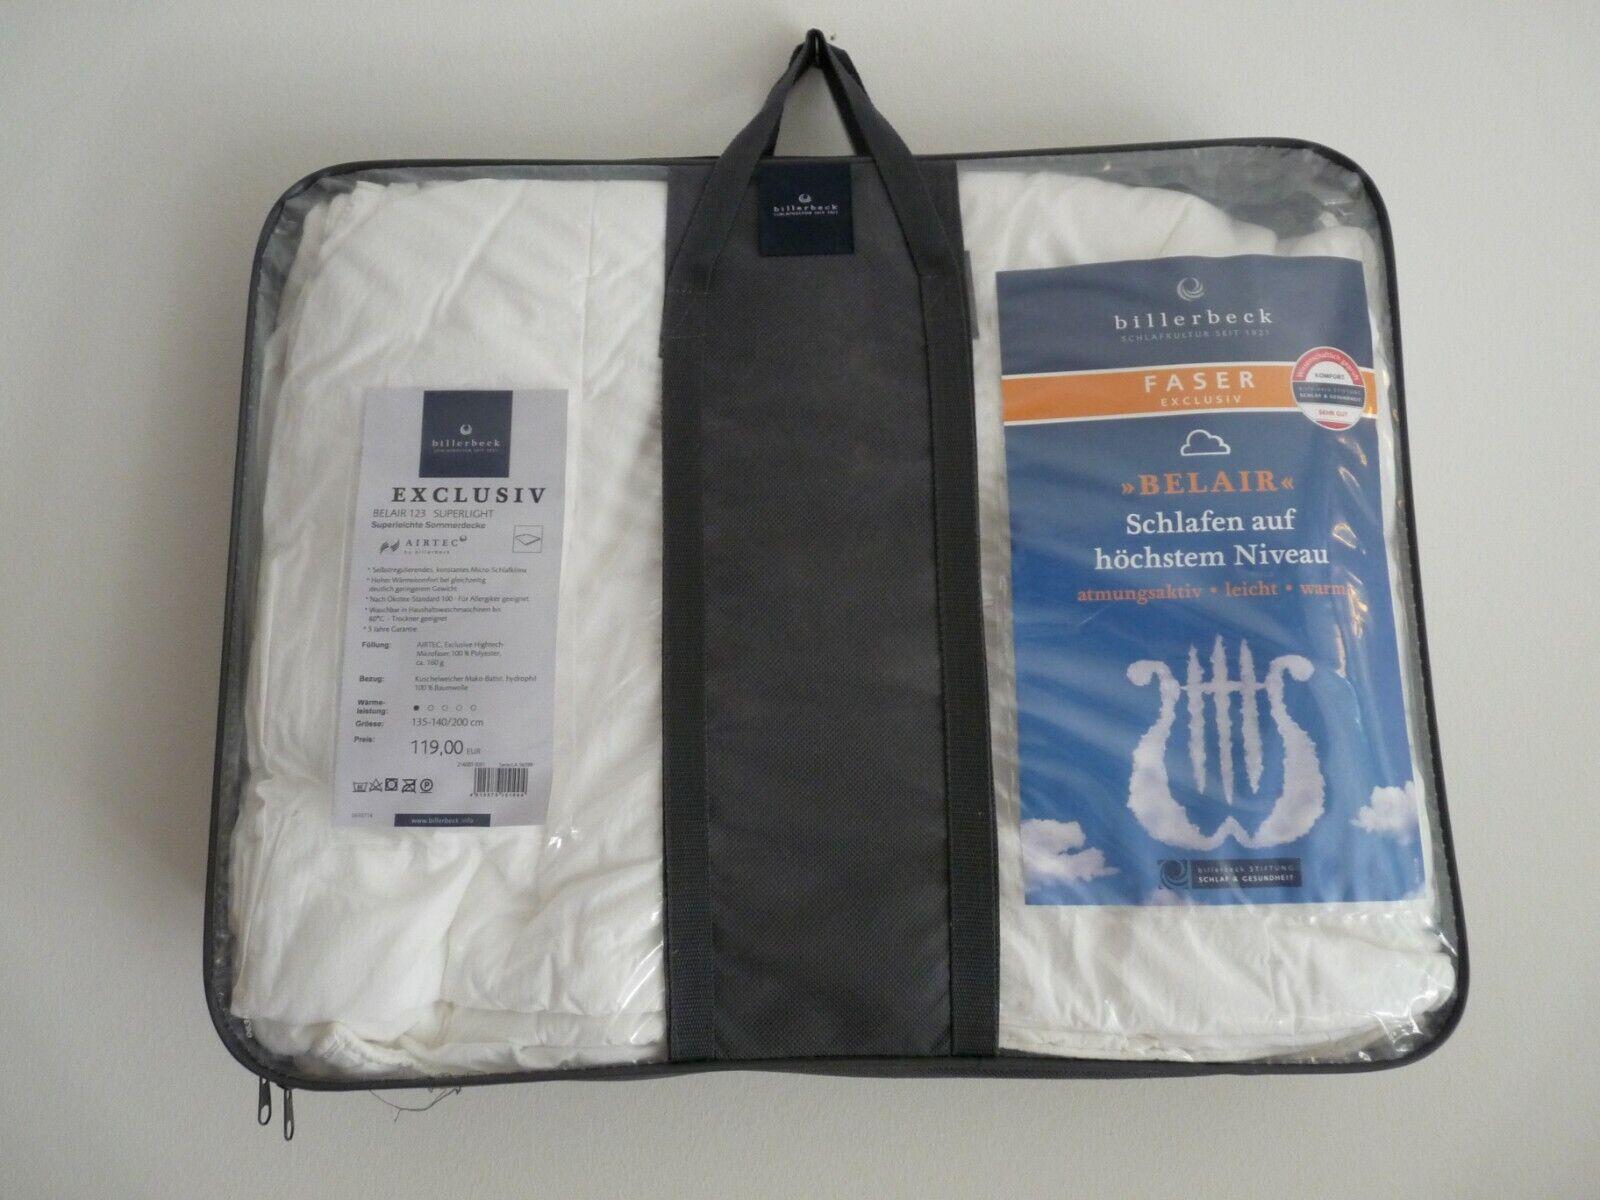 Billerbeck Super Lightweight Summer Blanket in Original Box, 135-140/200 cm